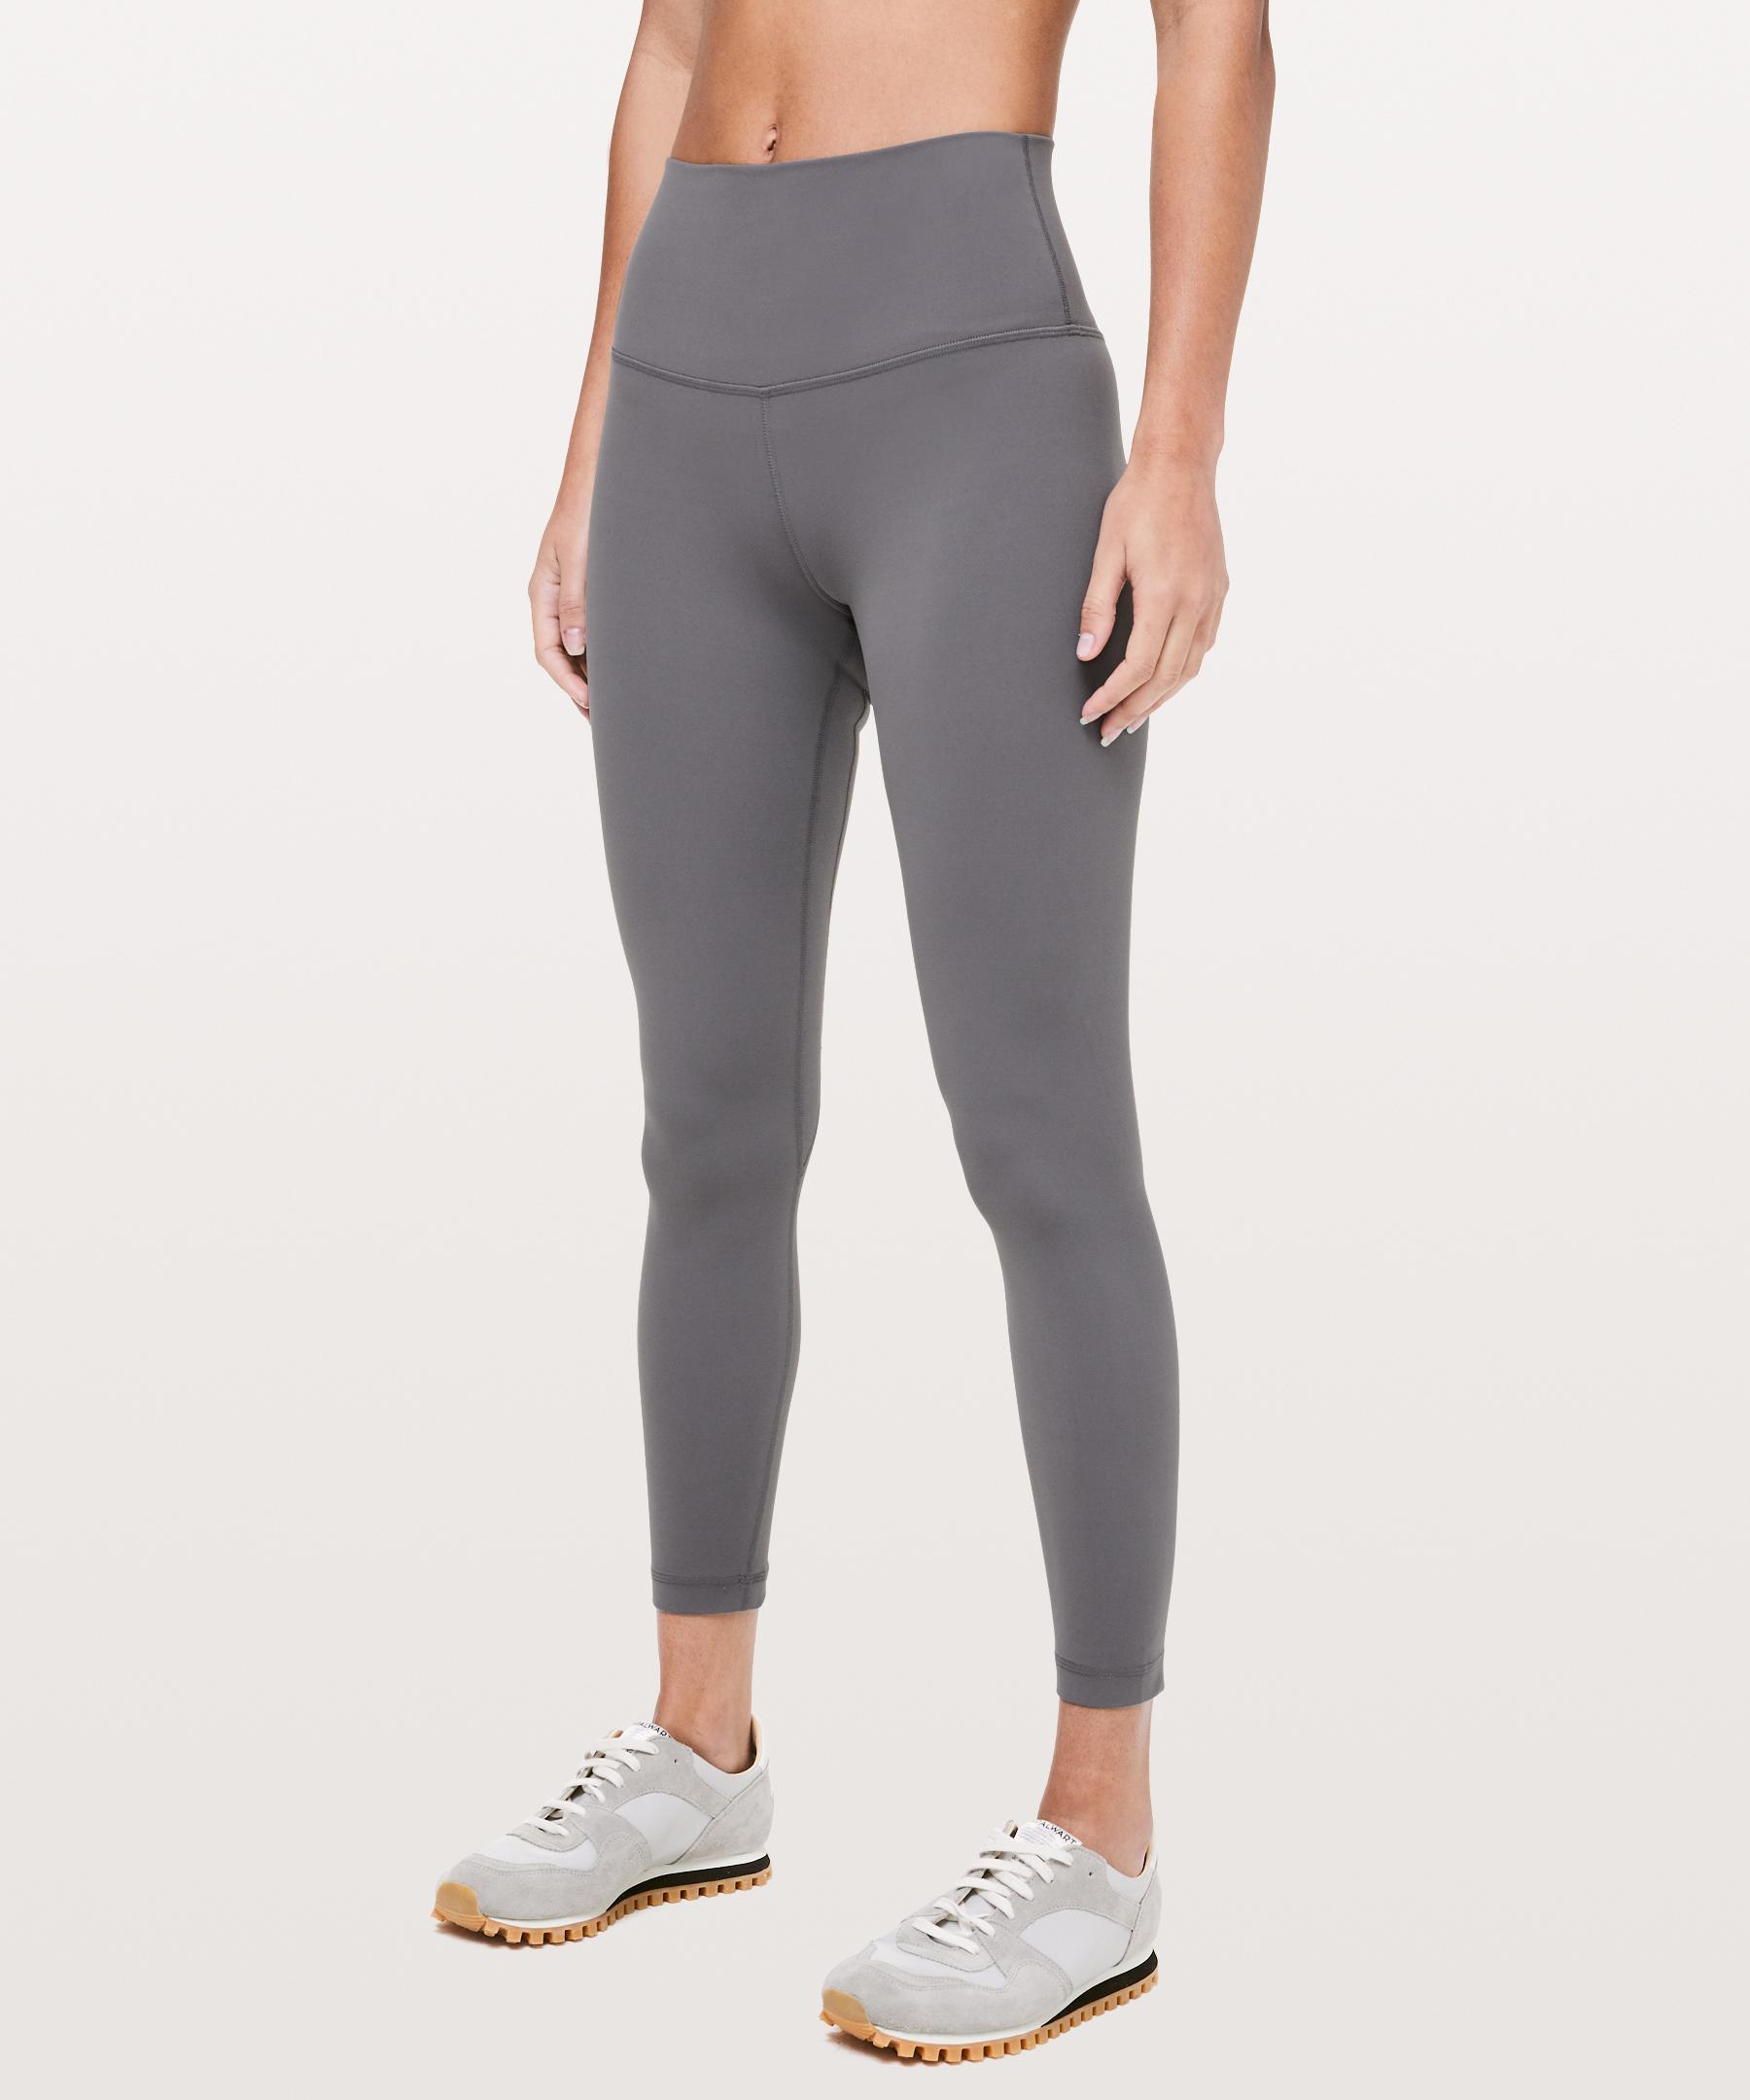 02438cf0f9db5 lululemon athletica - Gray Align Pant Ii 25